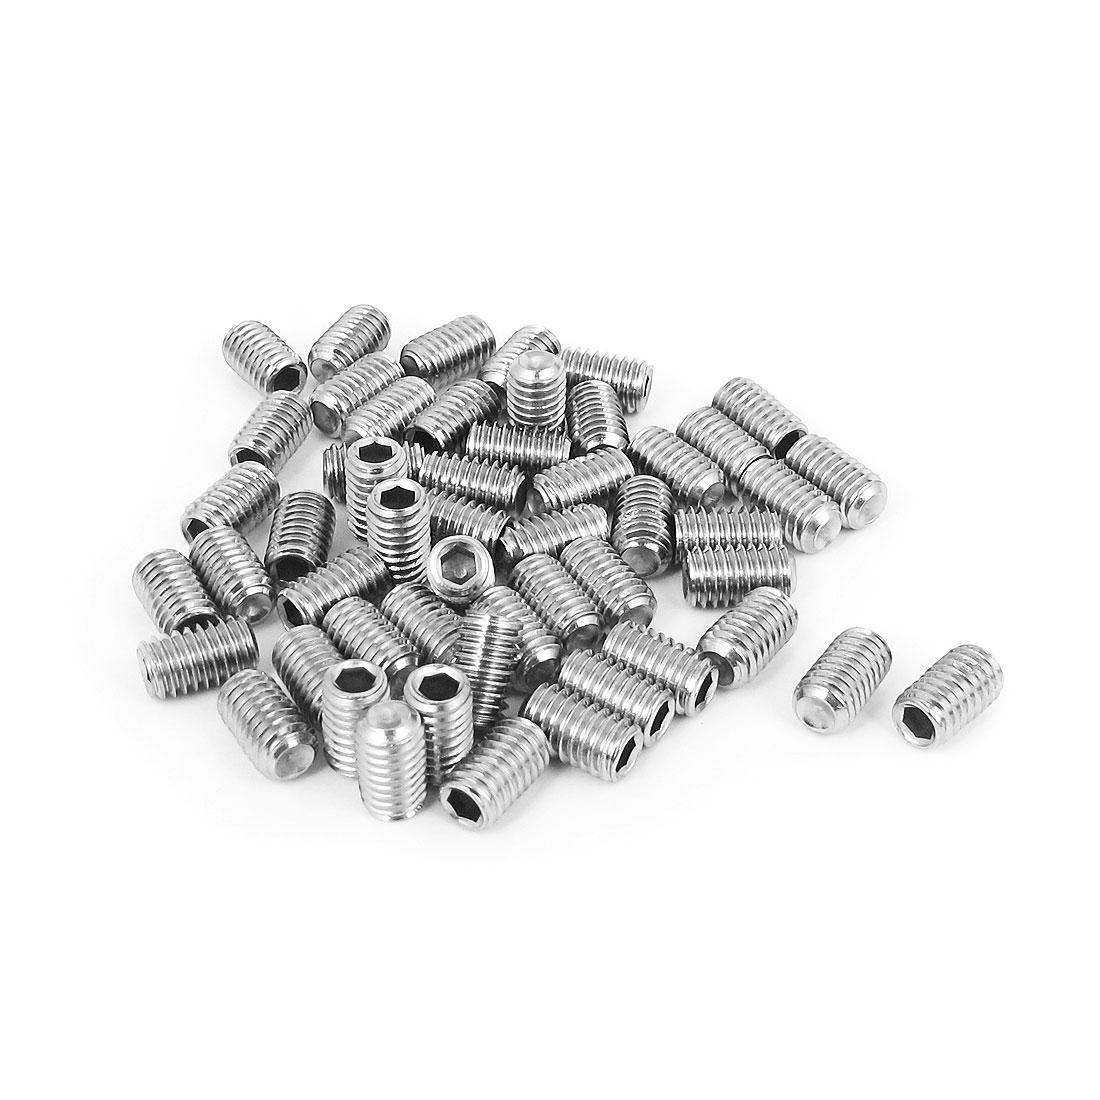 M6x10mm Stainless Steel Hex Socket Set Cap Point Grub Screws Silver Tone 50pcs